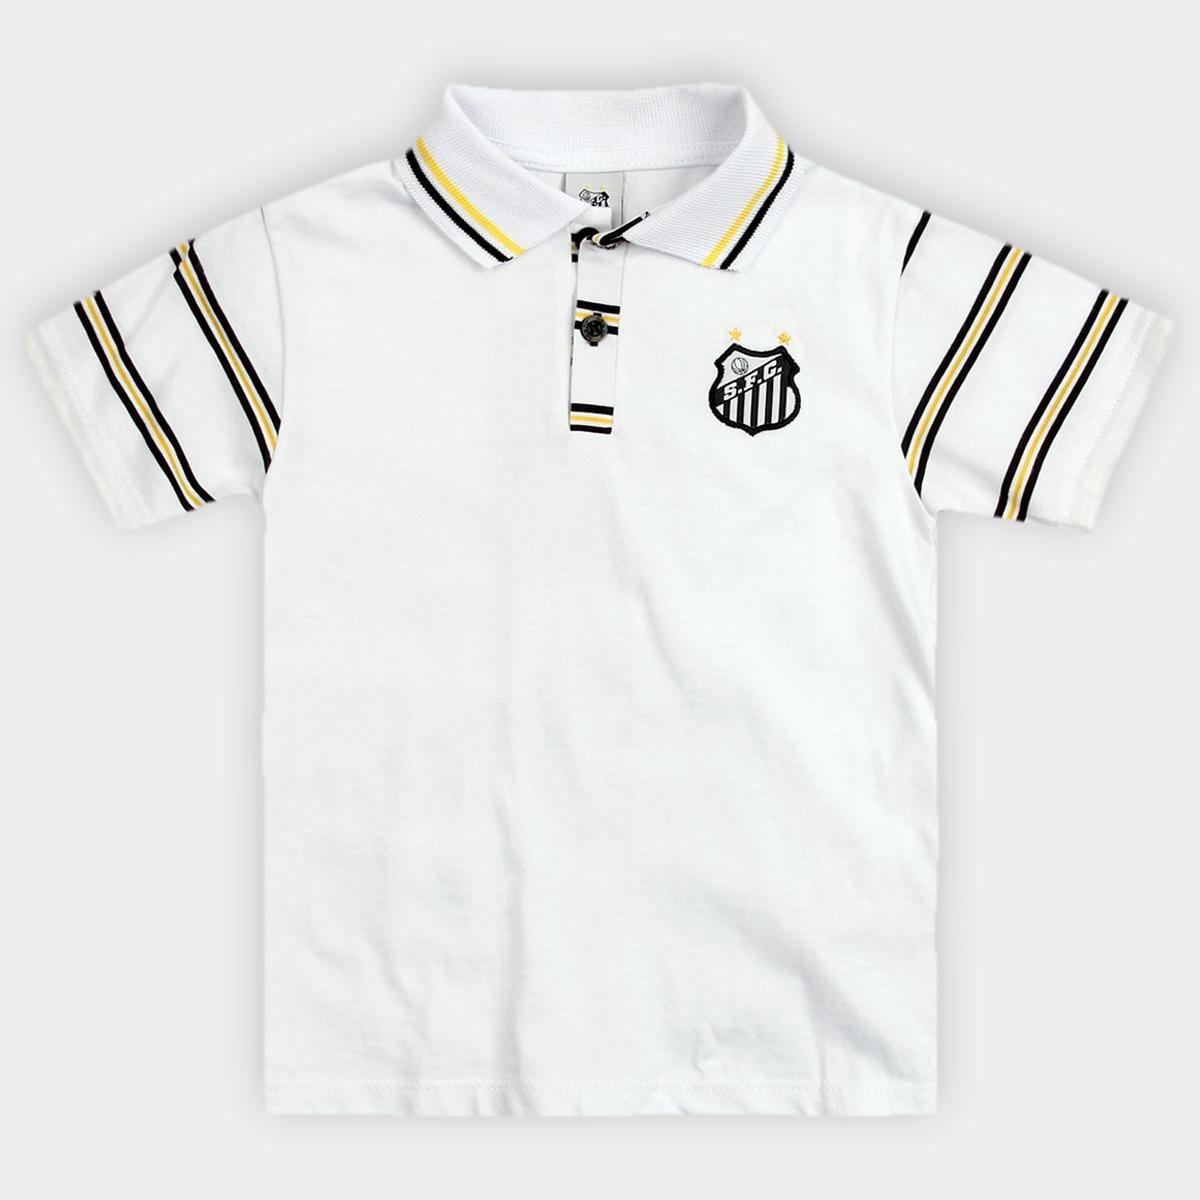 c69d5abe5fdac Camisa Polo Santos Infantil - Branco - Compre Agora